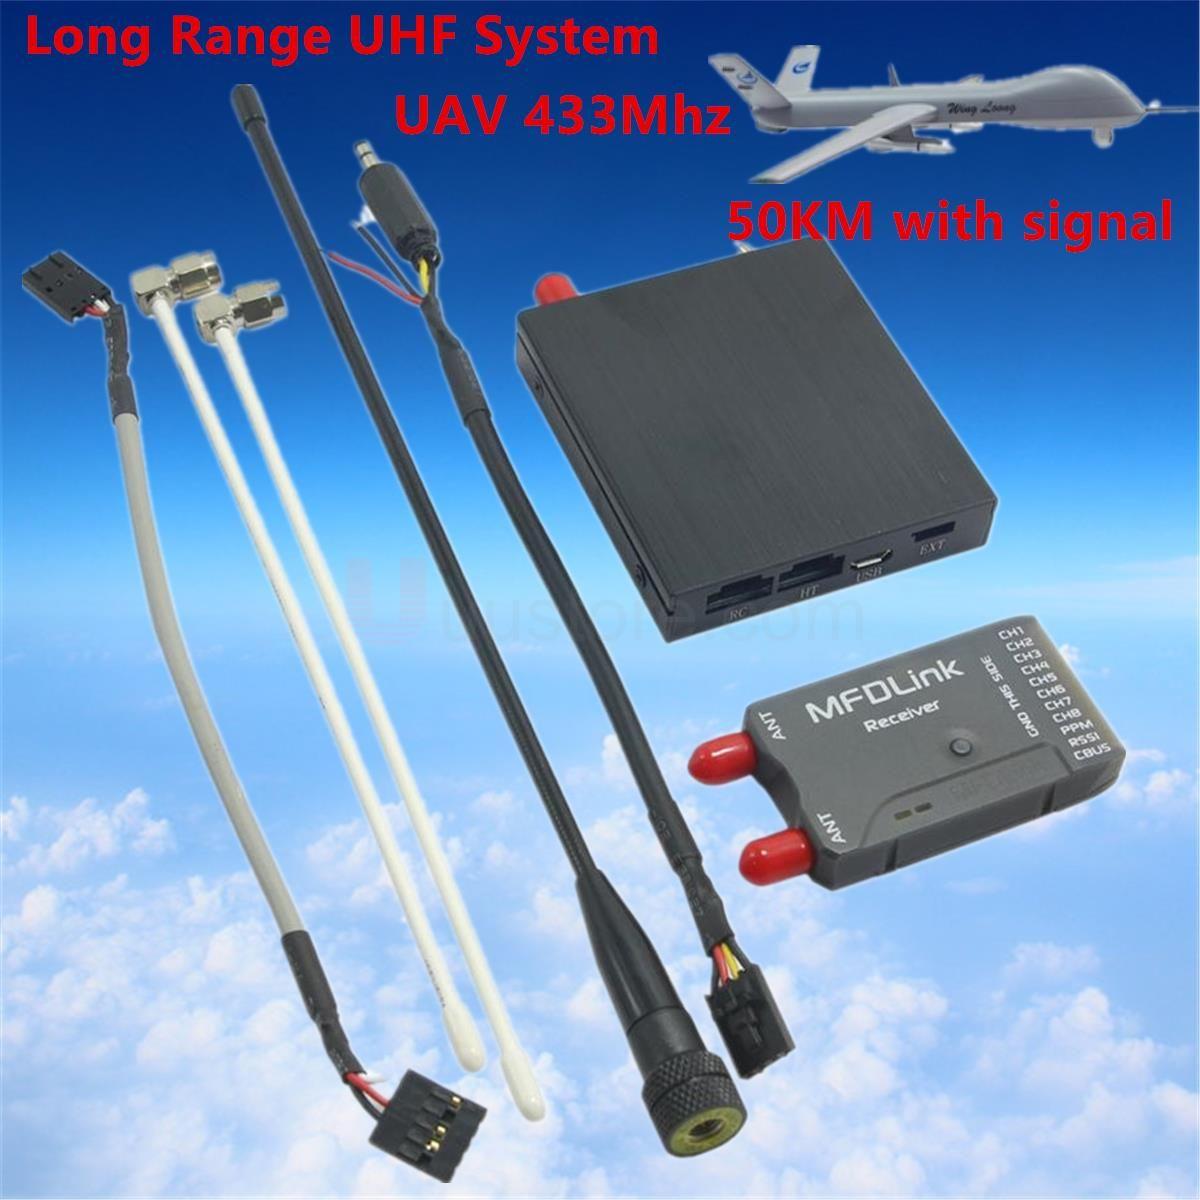 50 KM Long Range MFDLink Rlink 433 Mhz 16CH 1 Watt RC FPV UHF System Sender w/8 Kanal Receiver TX + RX Set Für hohe fpv qualität